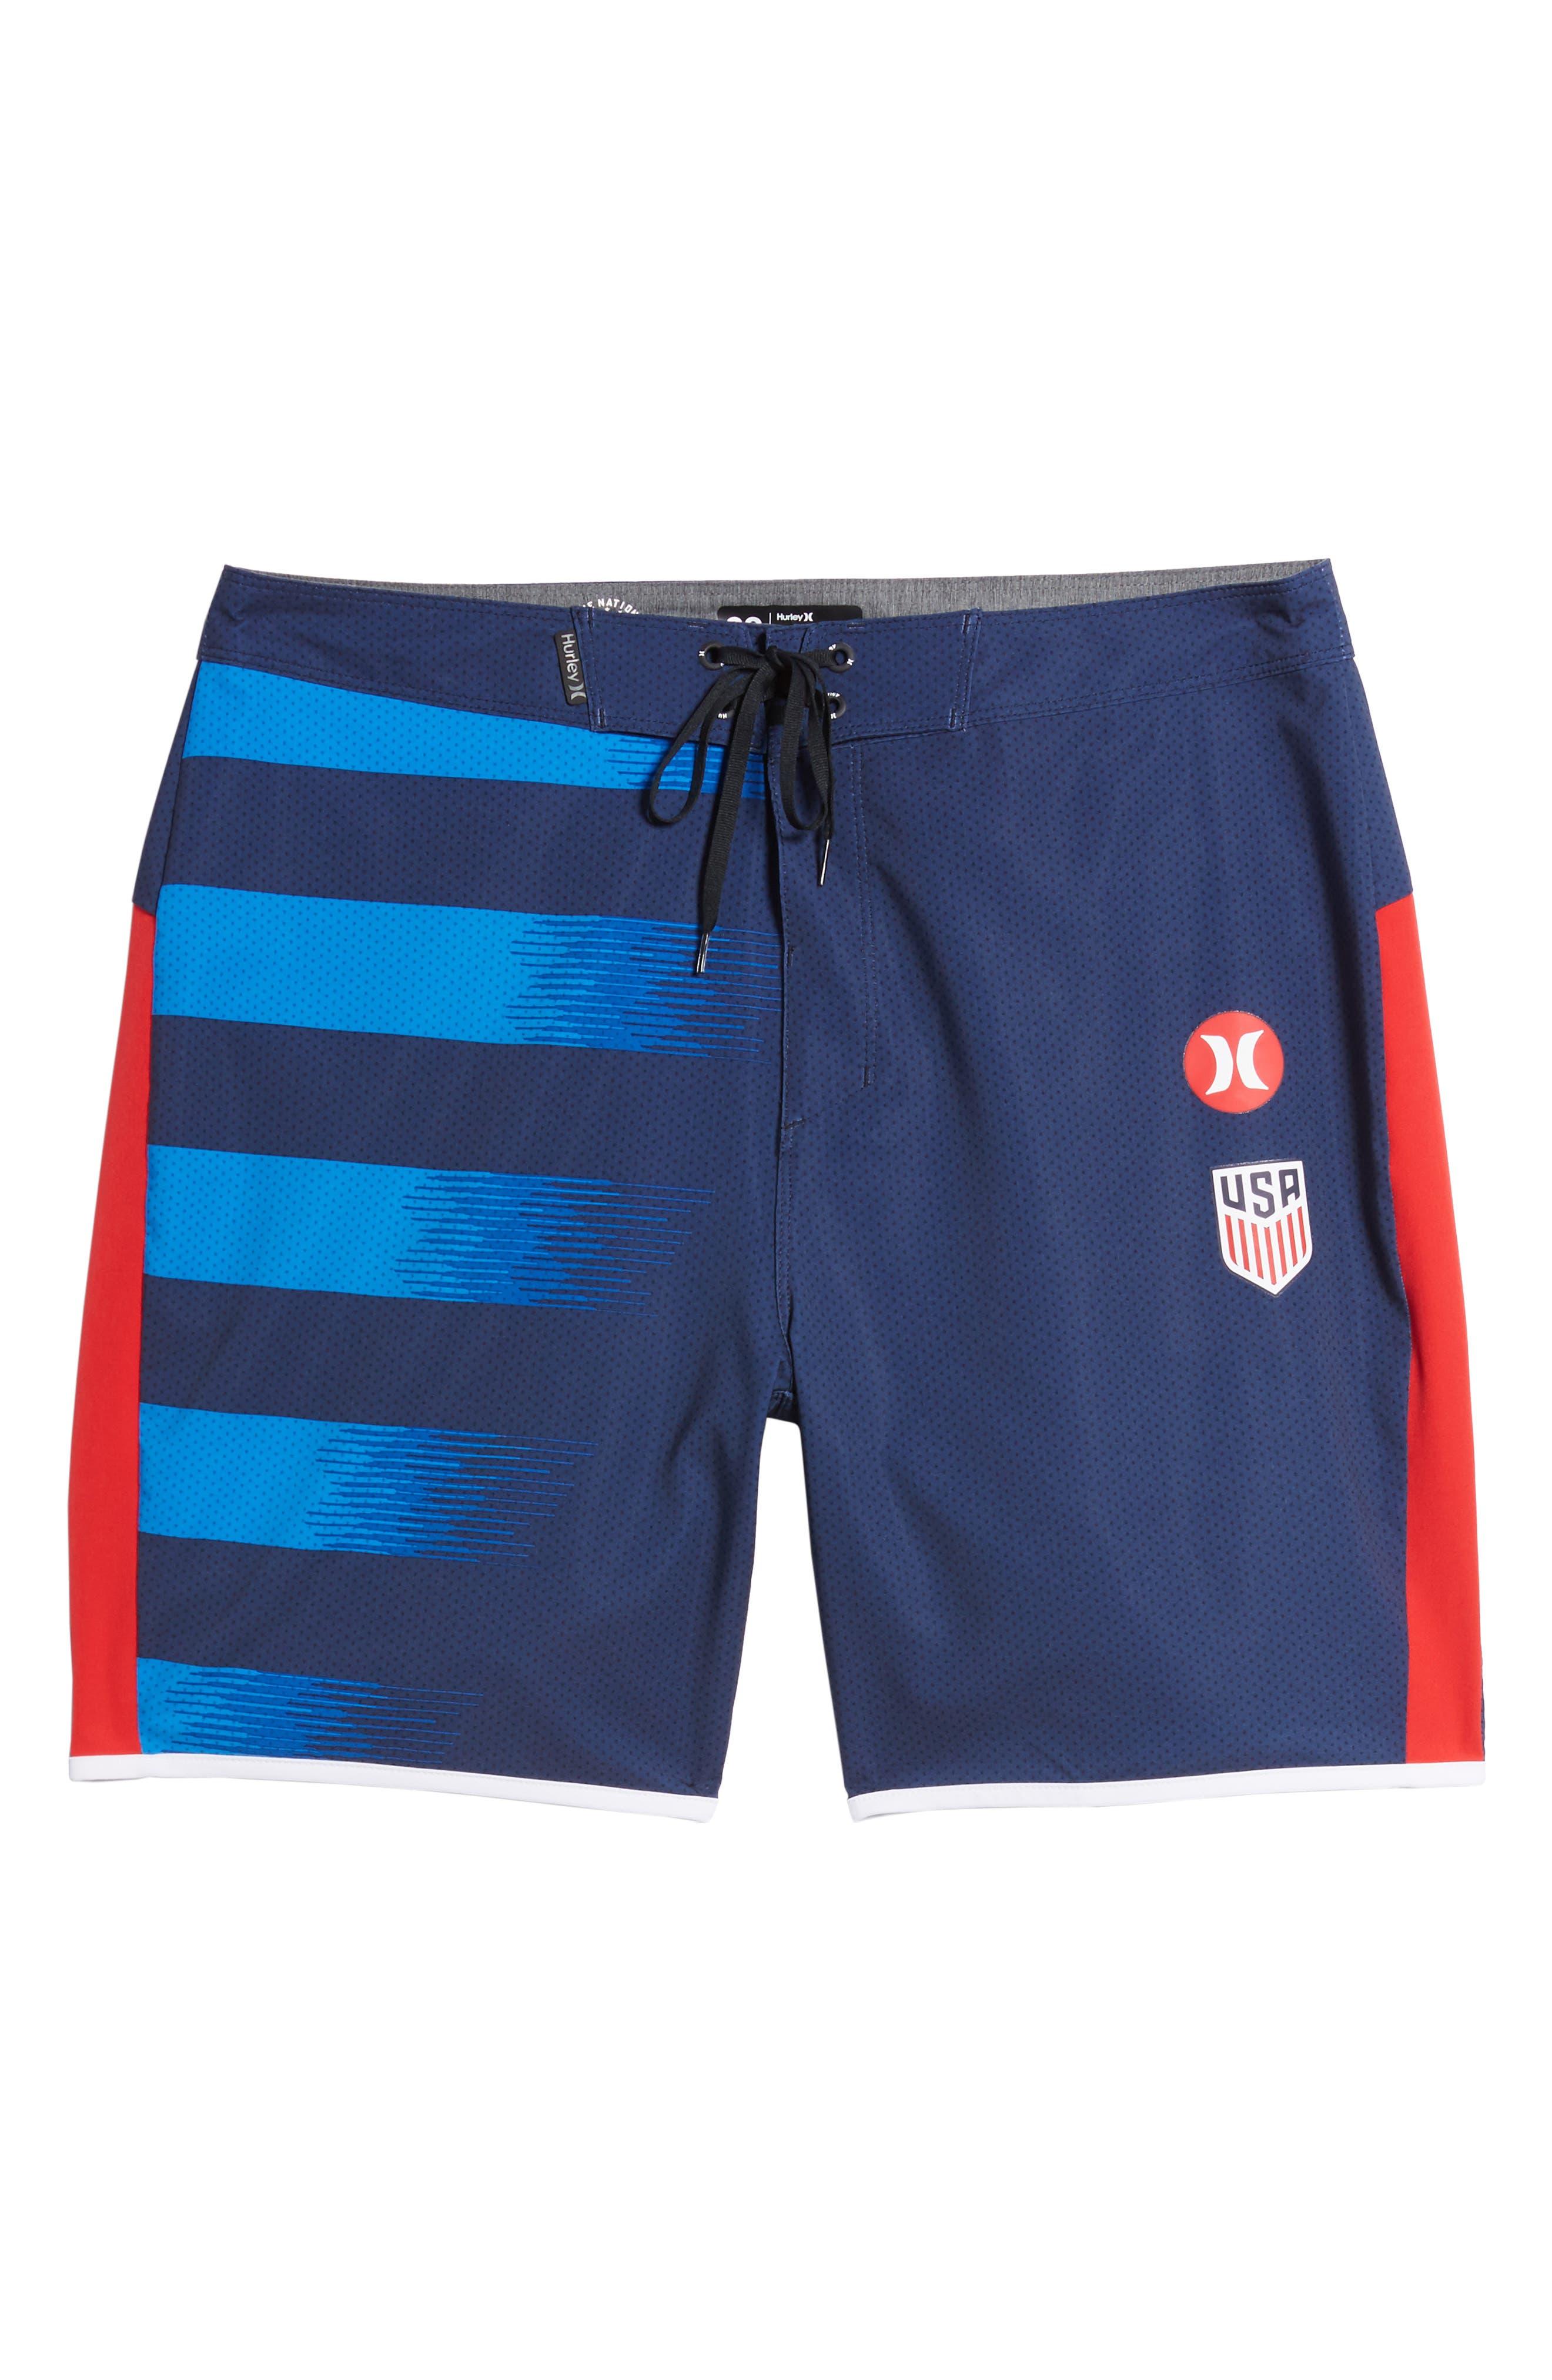 Phantom USA Away National Team Swim Shorts,                             Alternate thumbnail 6, color,                             Midnight Navy